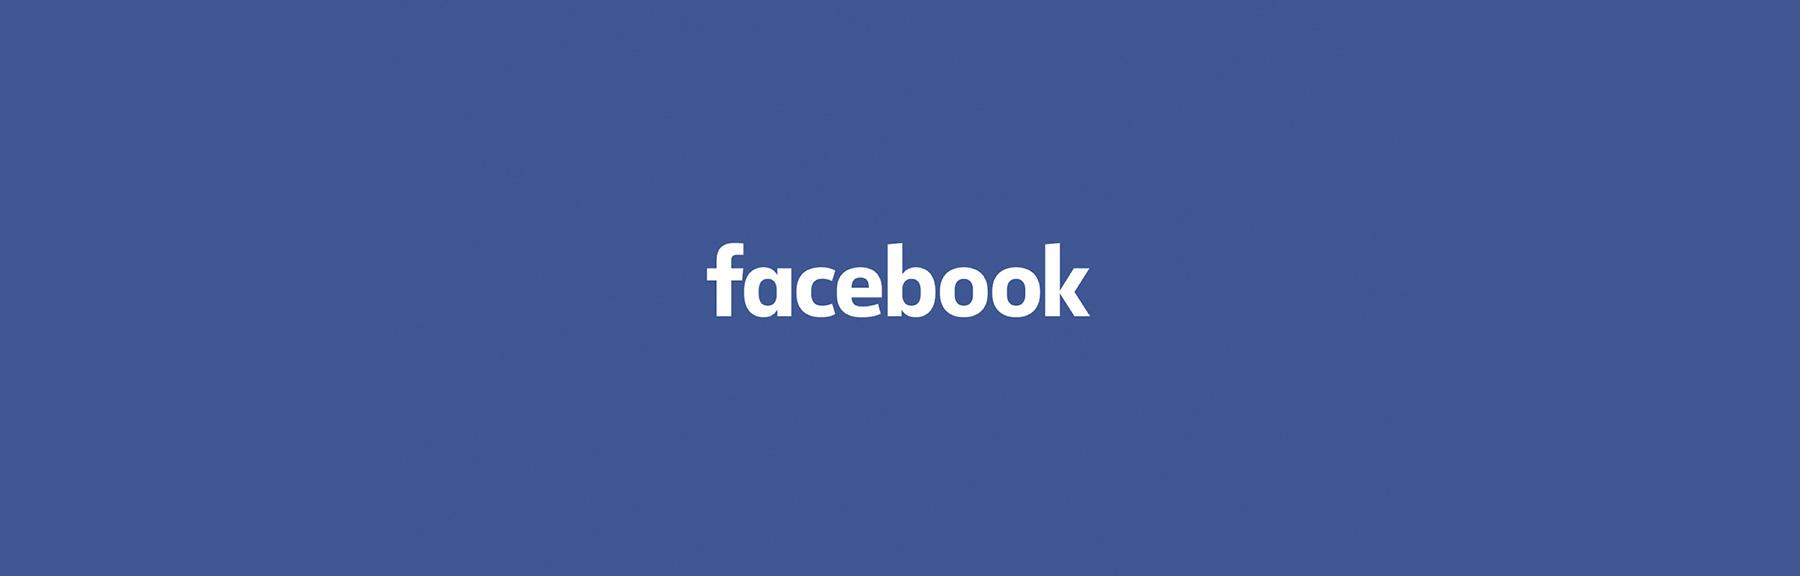 Facebook-Music-Slider